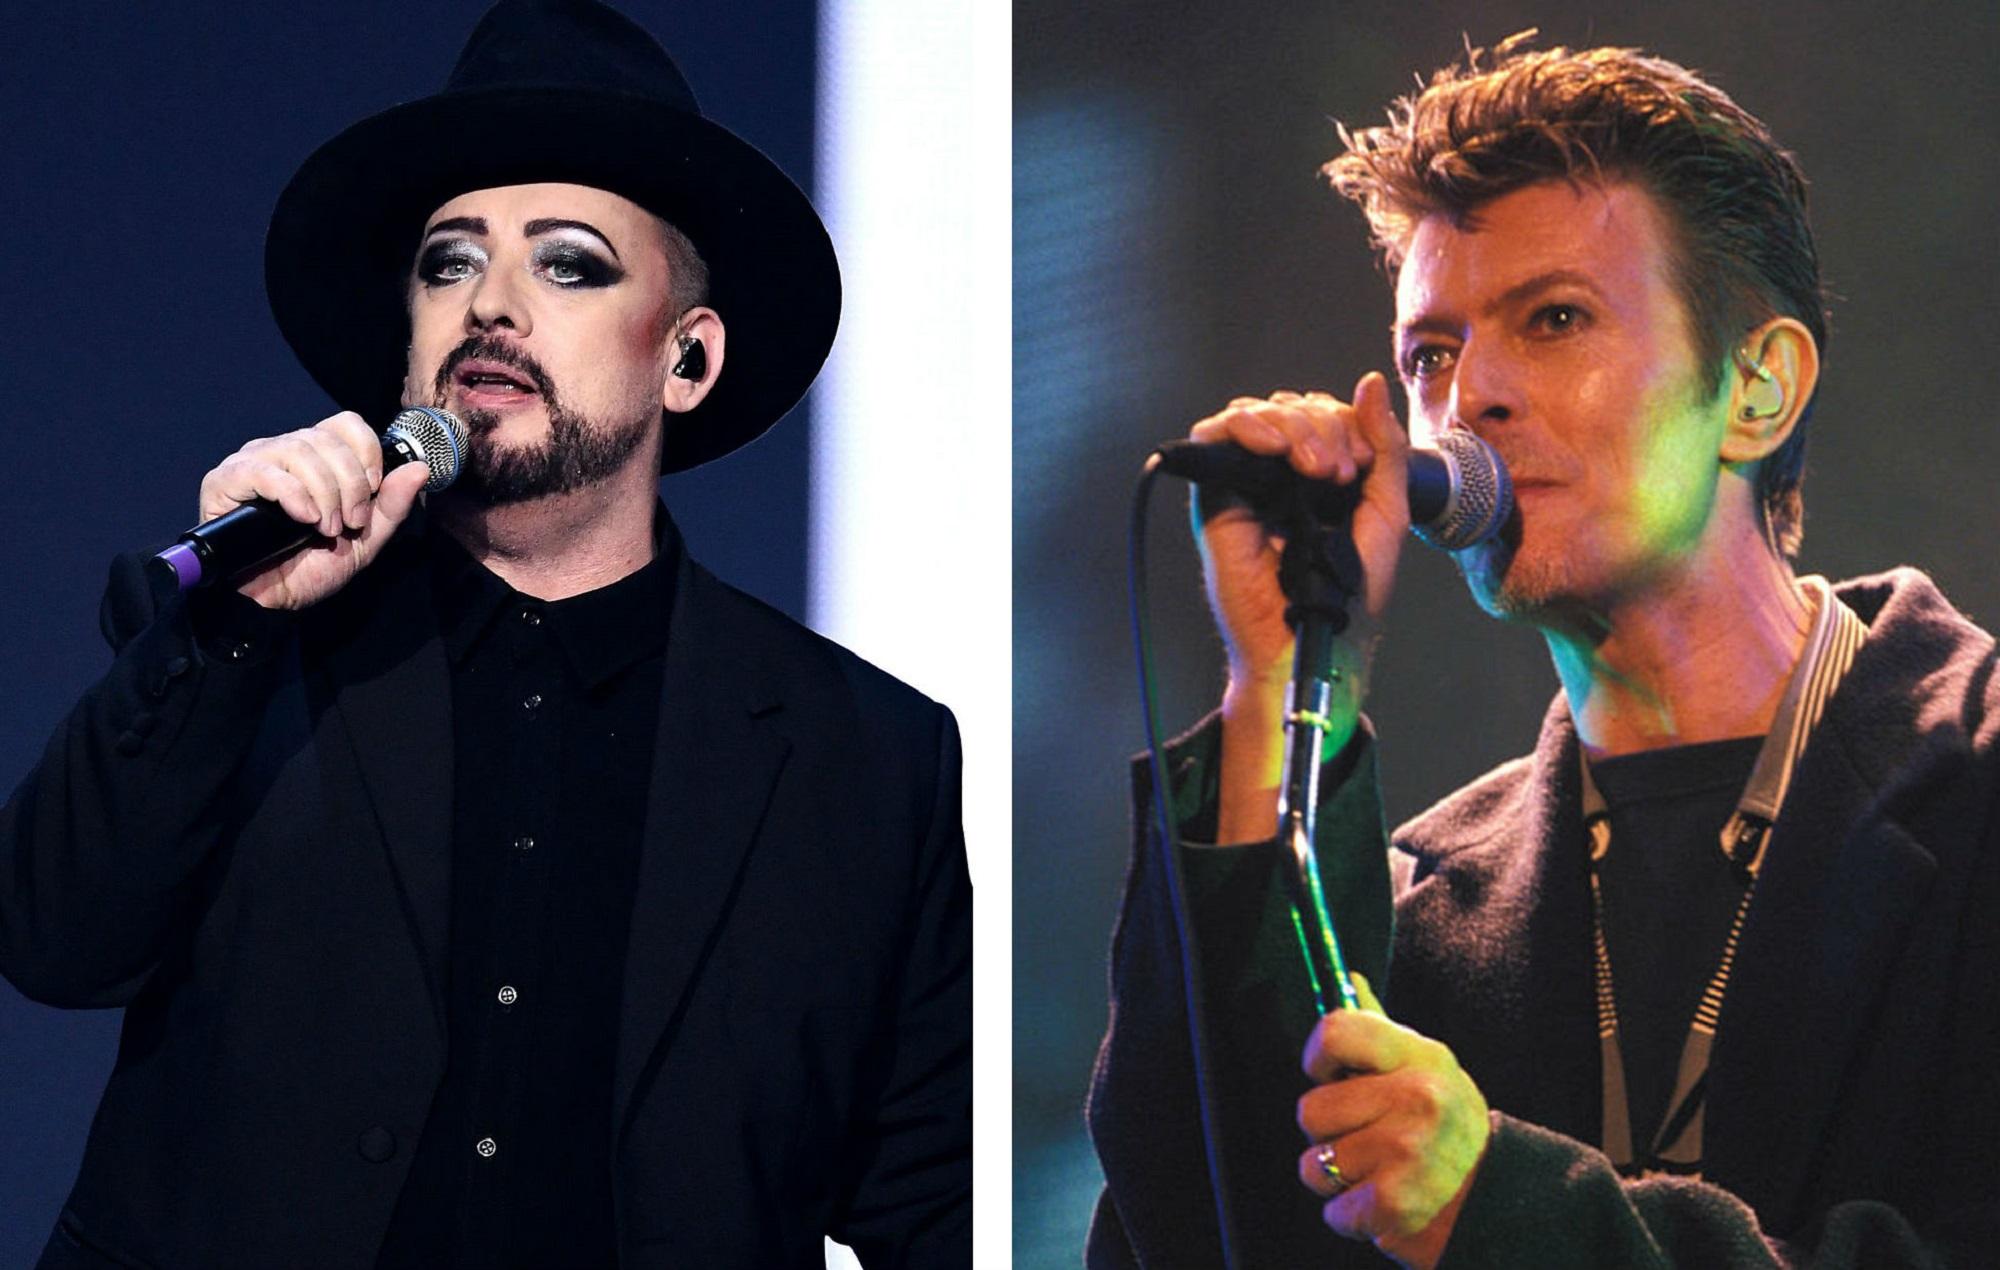 Boy George and David Bowie